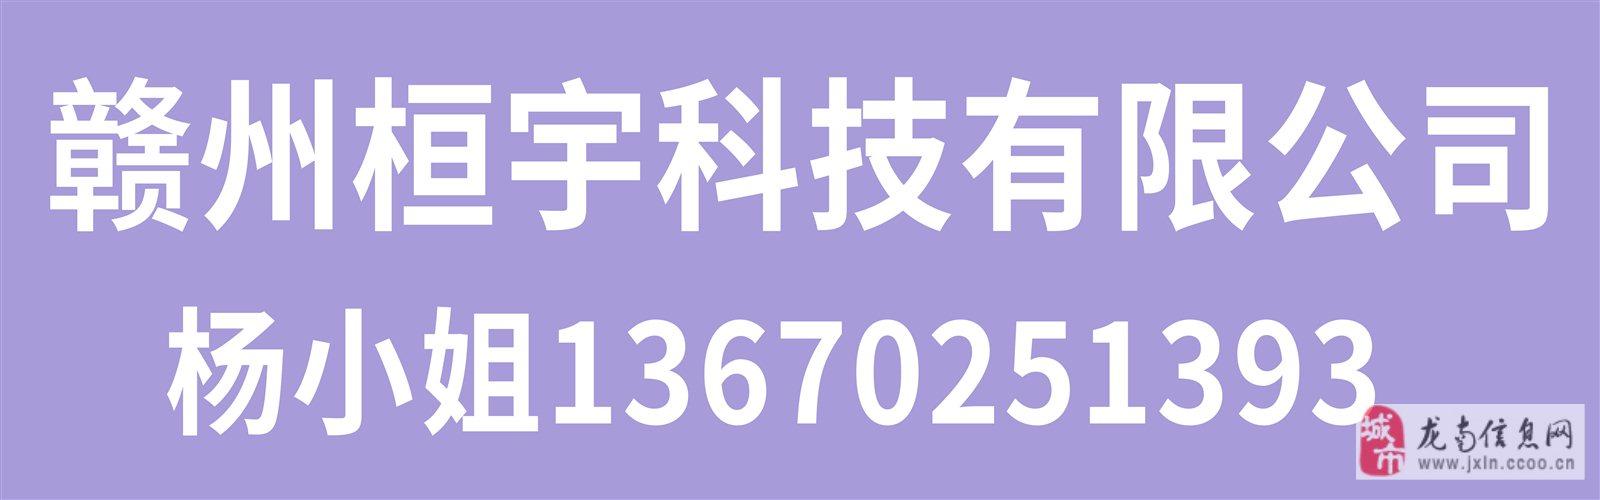 �M州桓宇科技有限公司